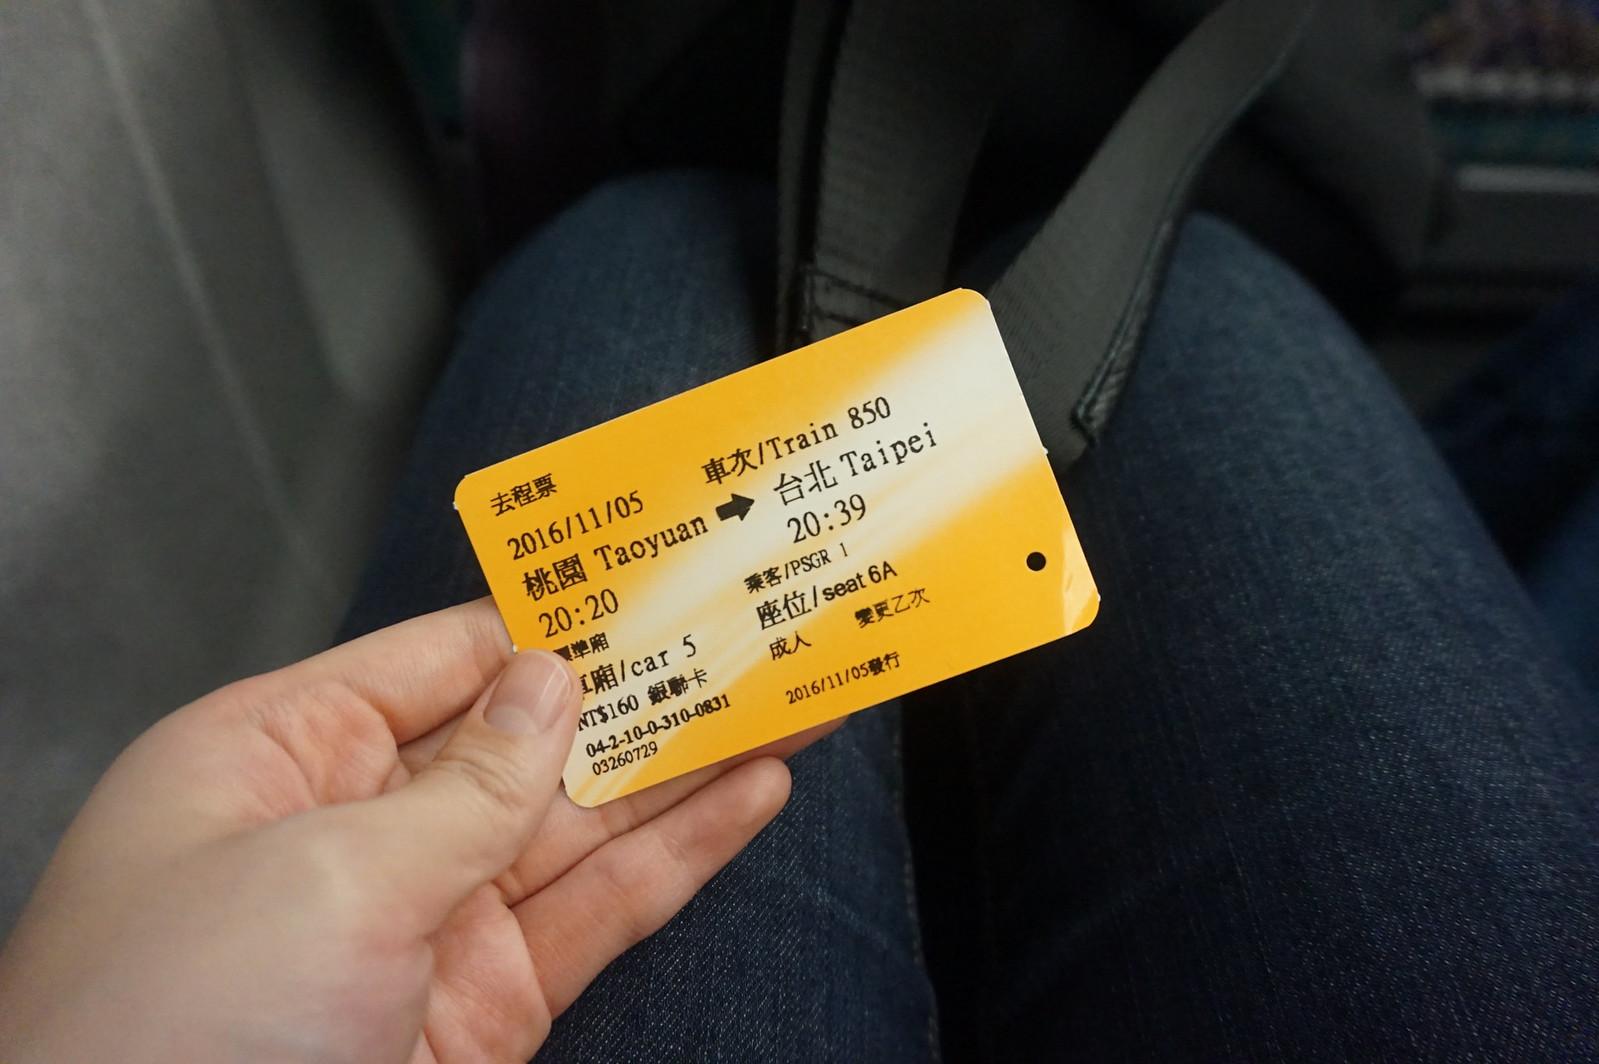 TSRT Ticket